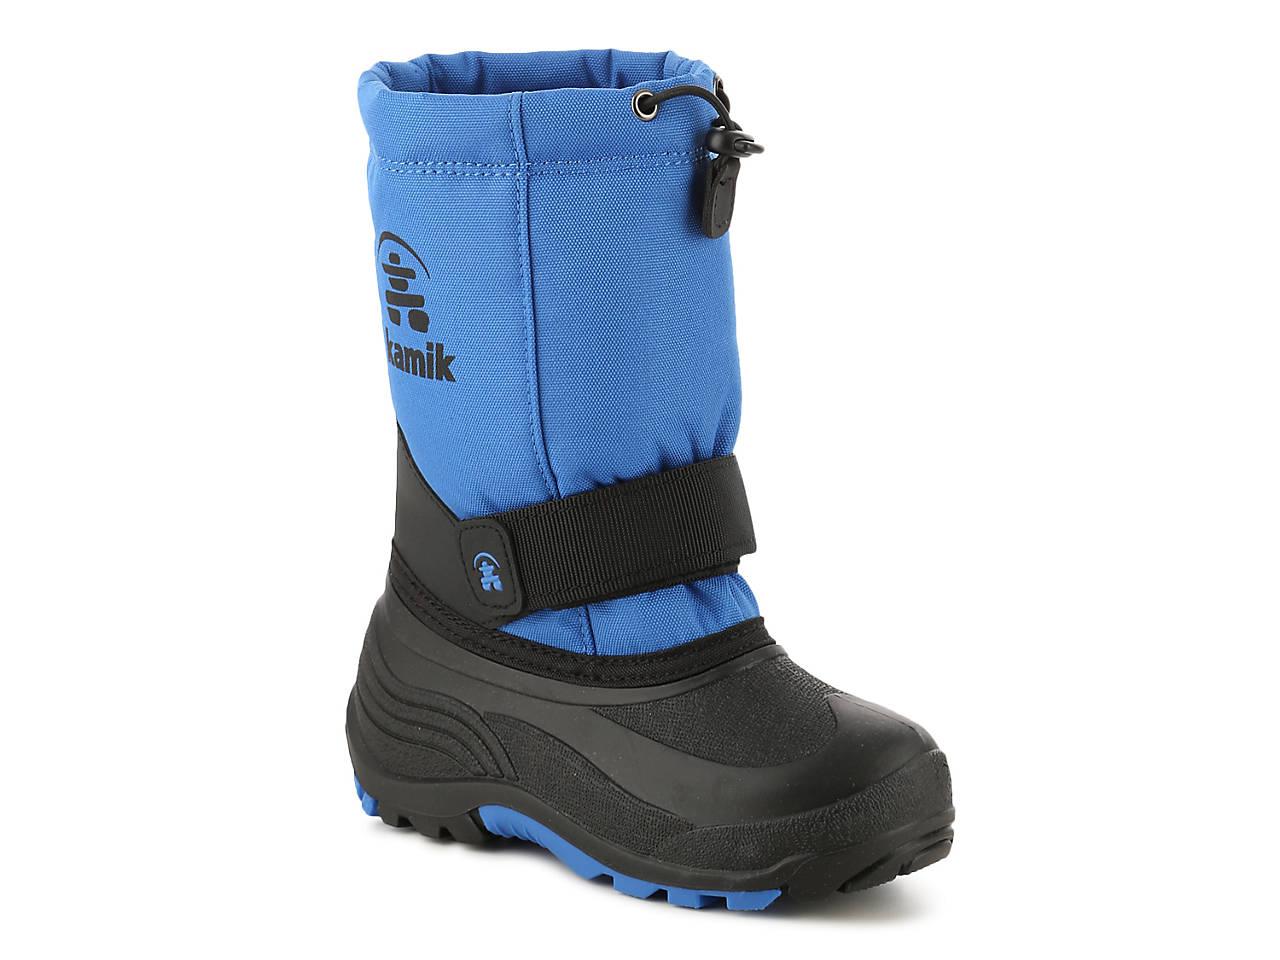 Black sandals for toddler boy - Rocket Toddler Youth Snow Boot